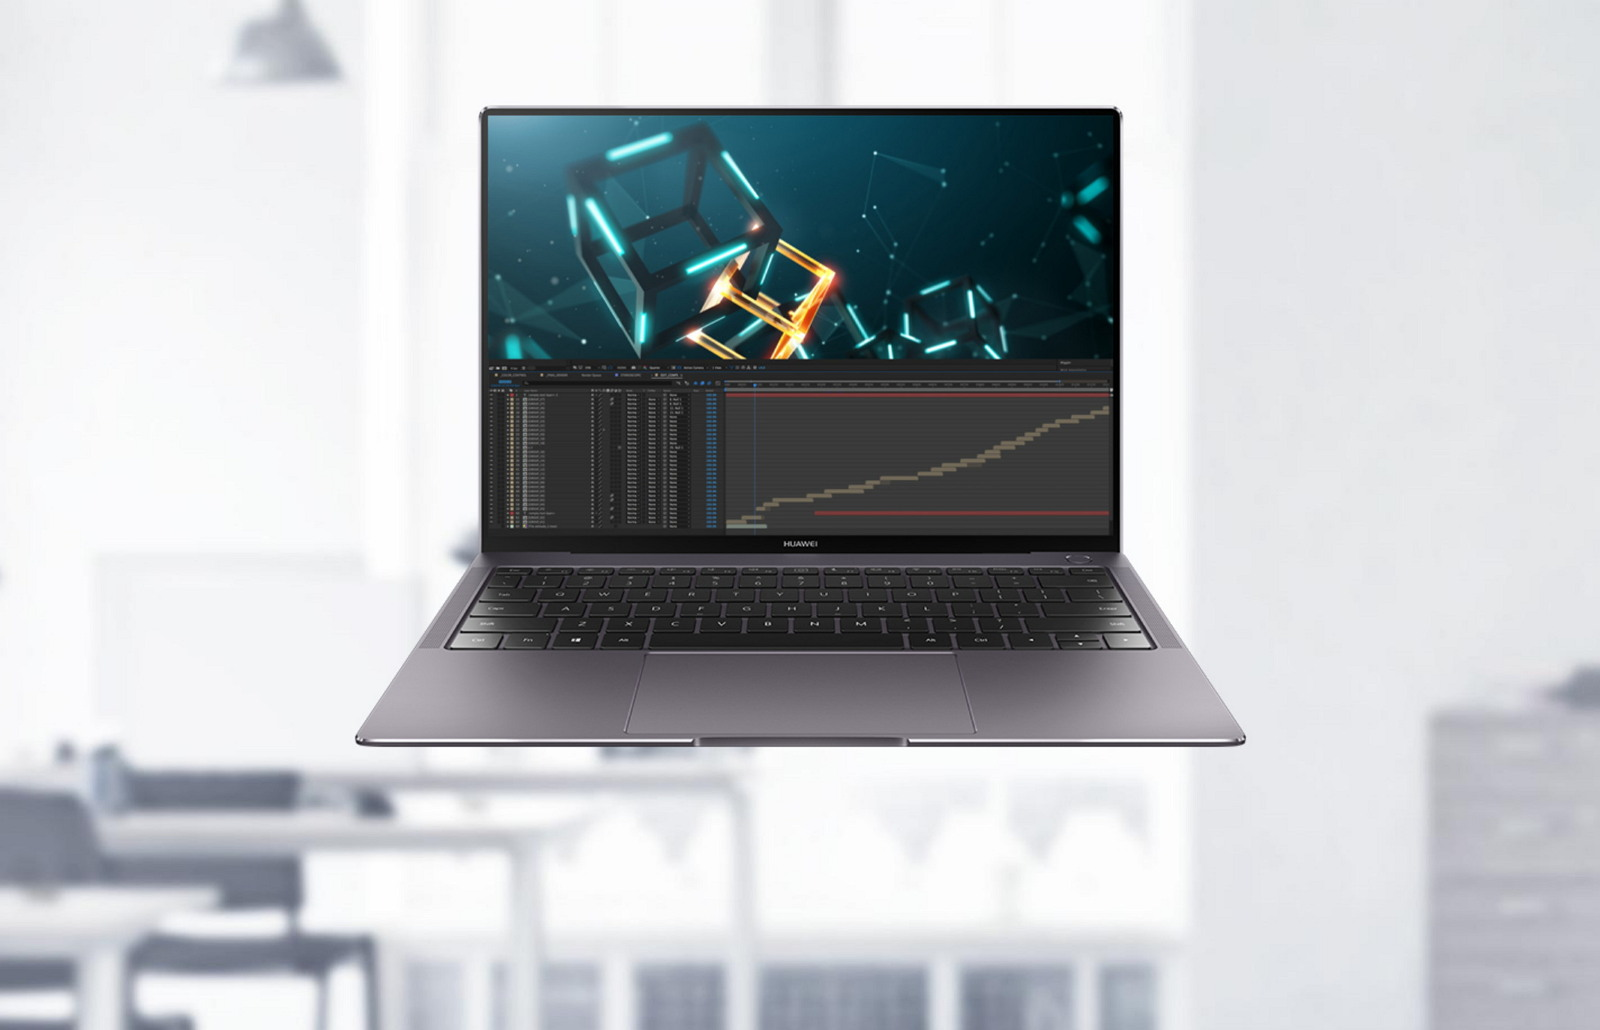 Huawei MateBook X Pro (2018)